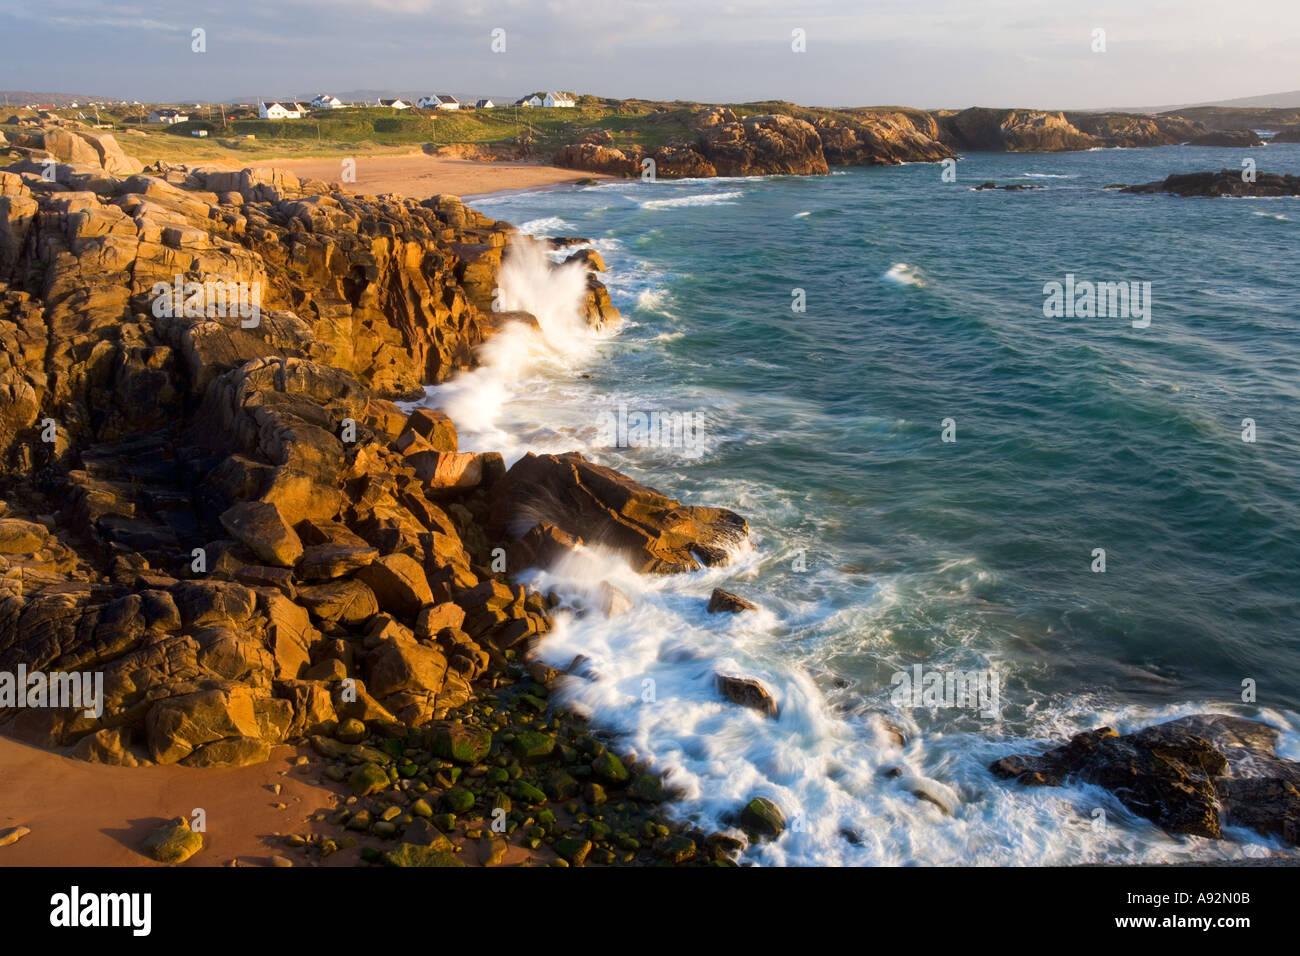 Atlantic Ocean Cruit Island Co Donegal Ireland - Stock Image